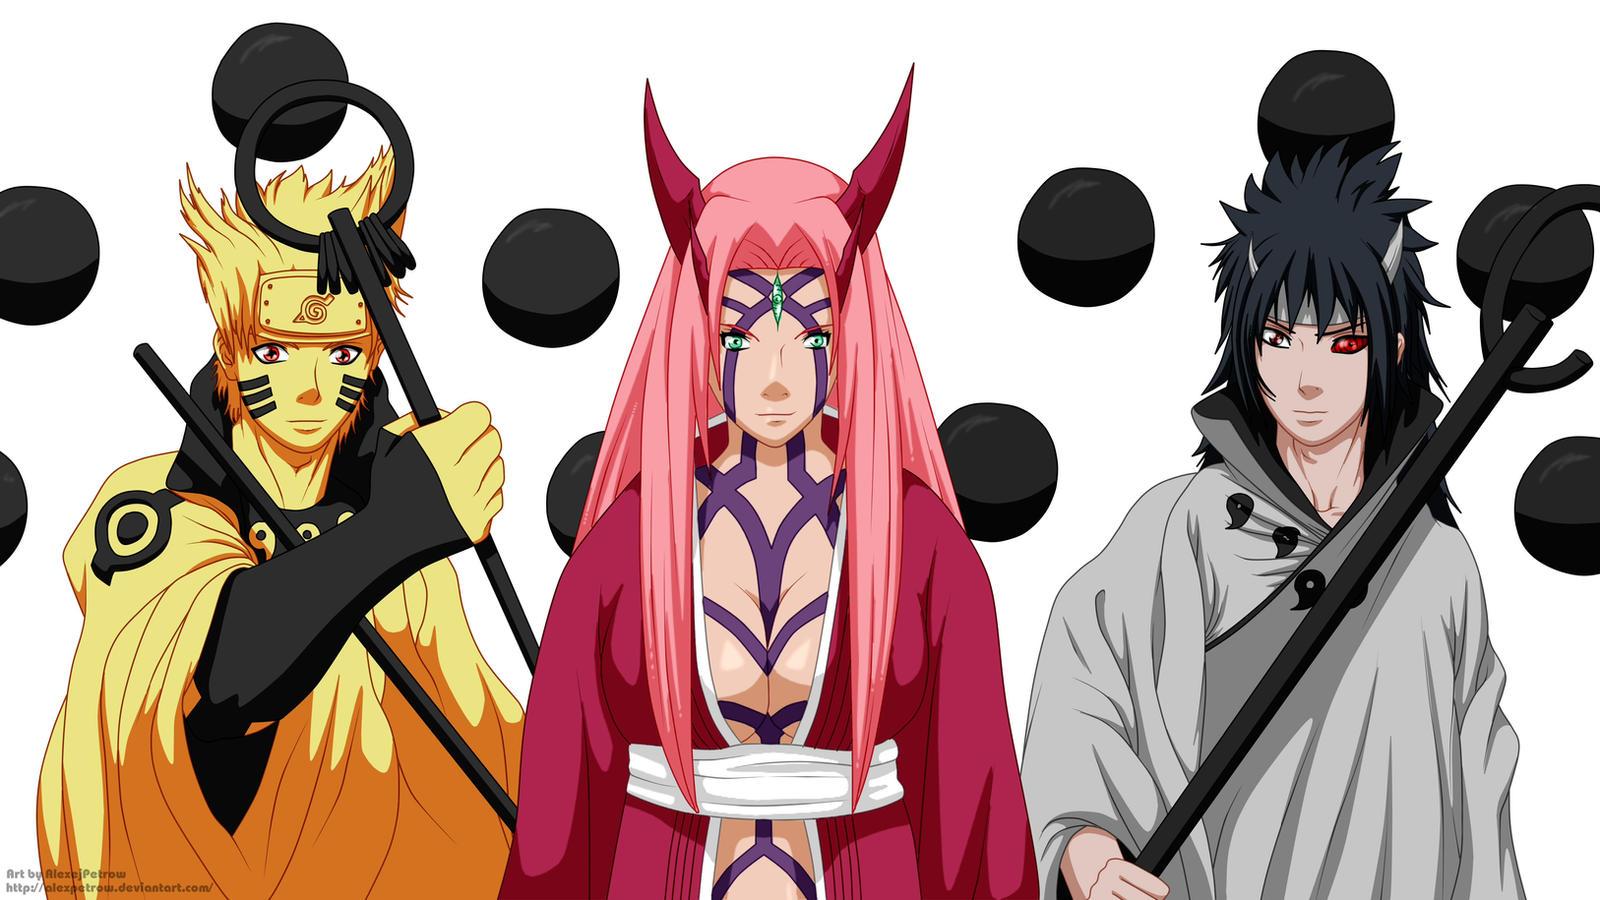 Team 7 (Naruto Sakura Sasuke) final form by AlexPetrow